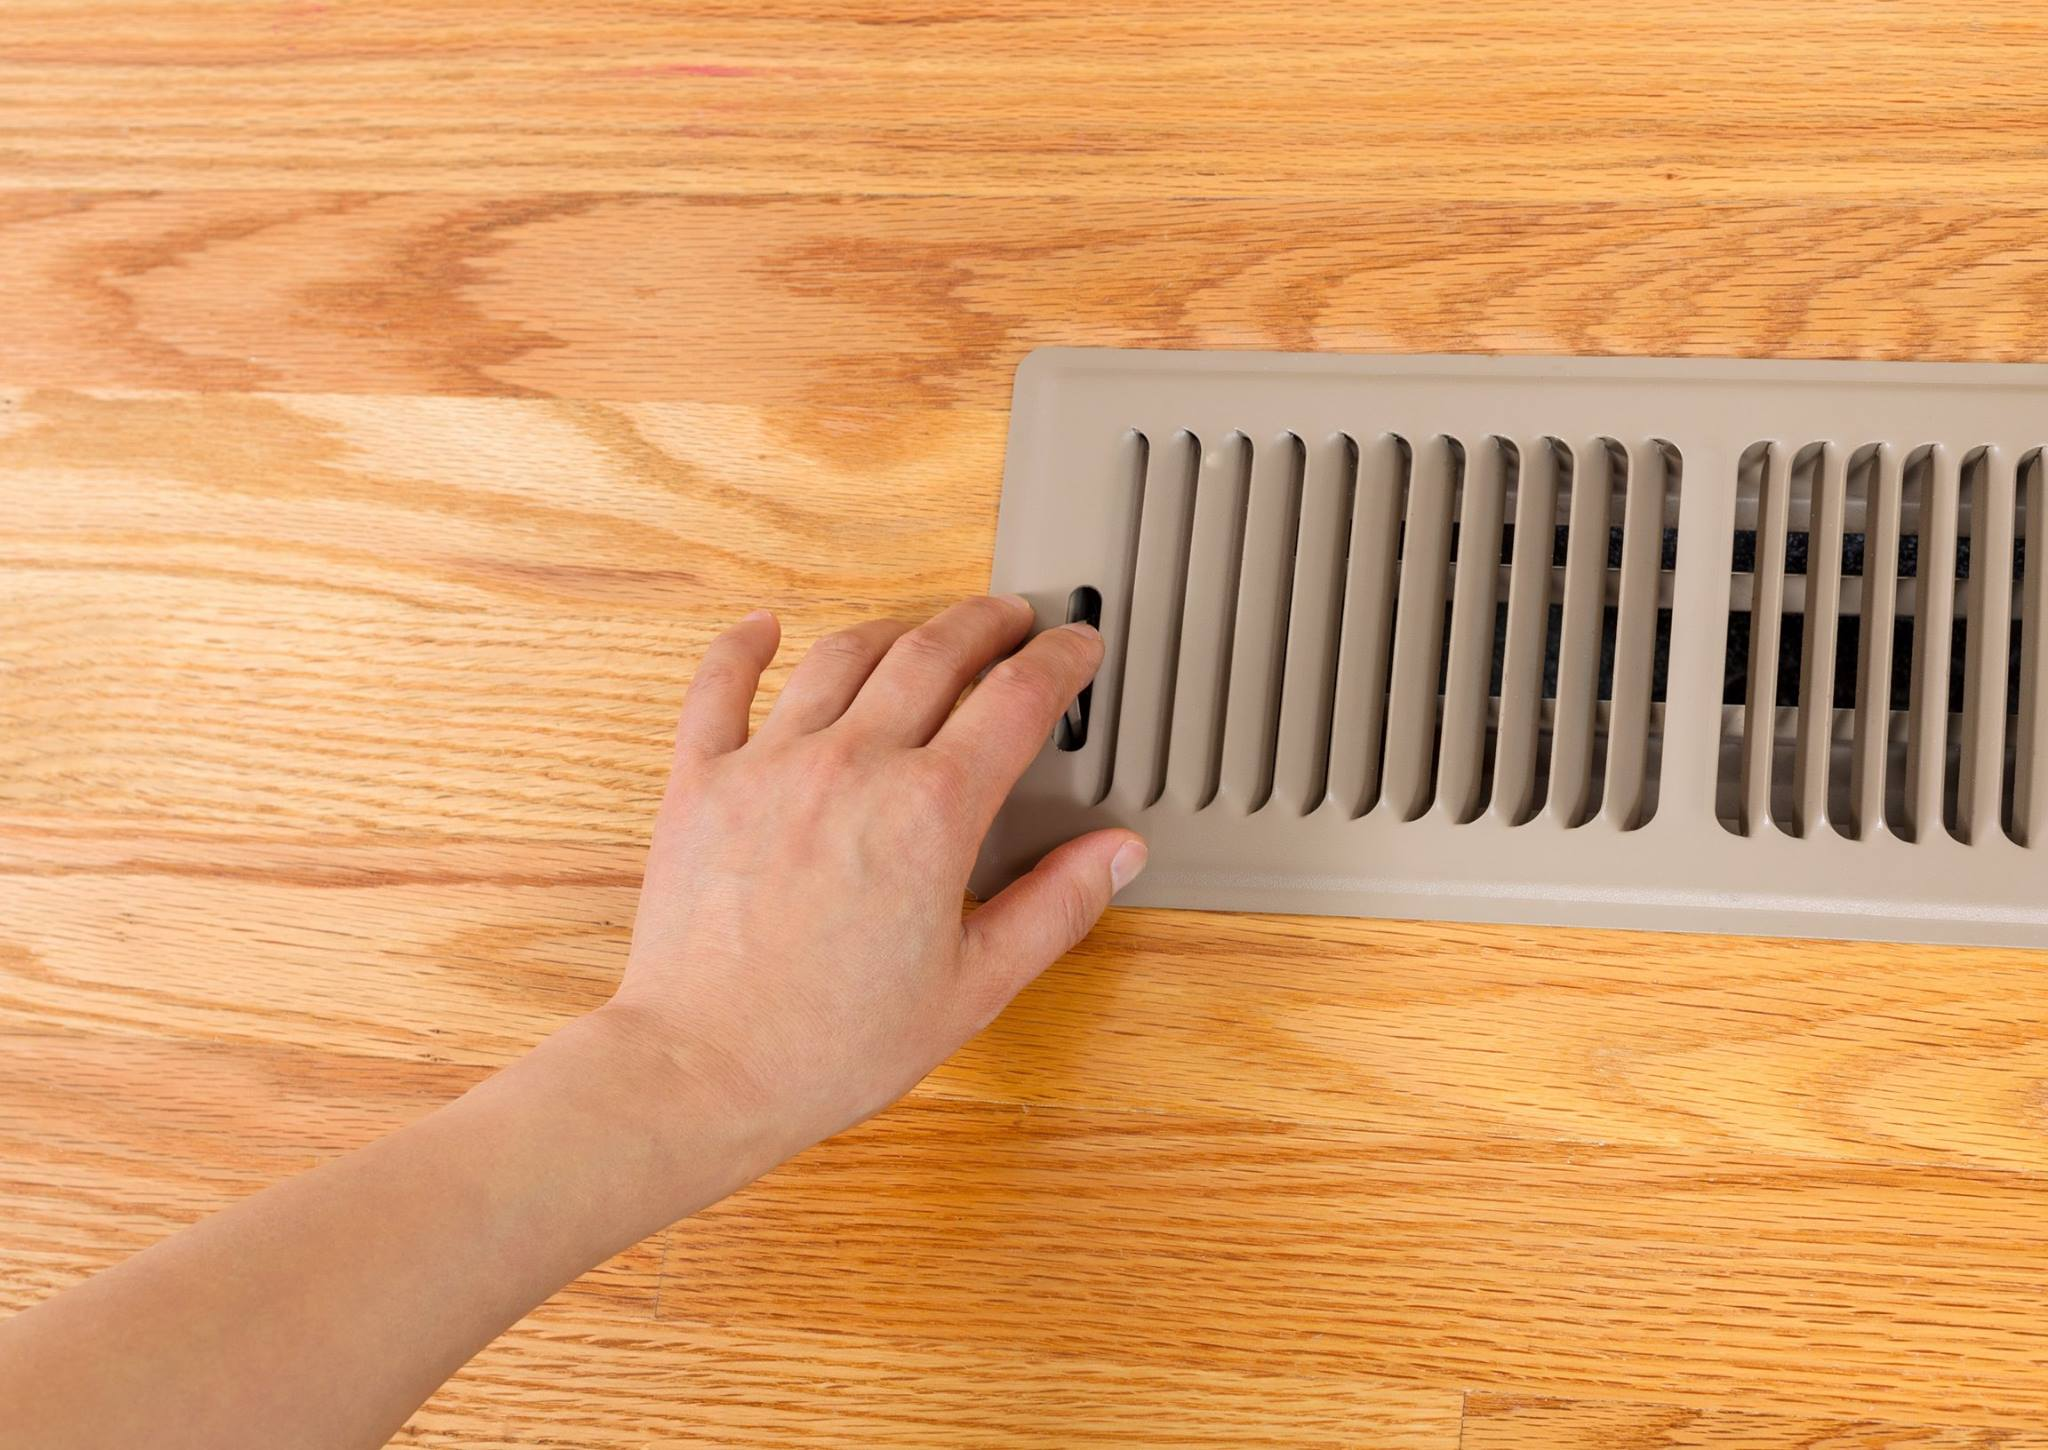 vent on floor.jpg